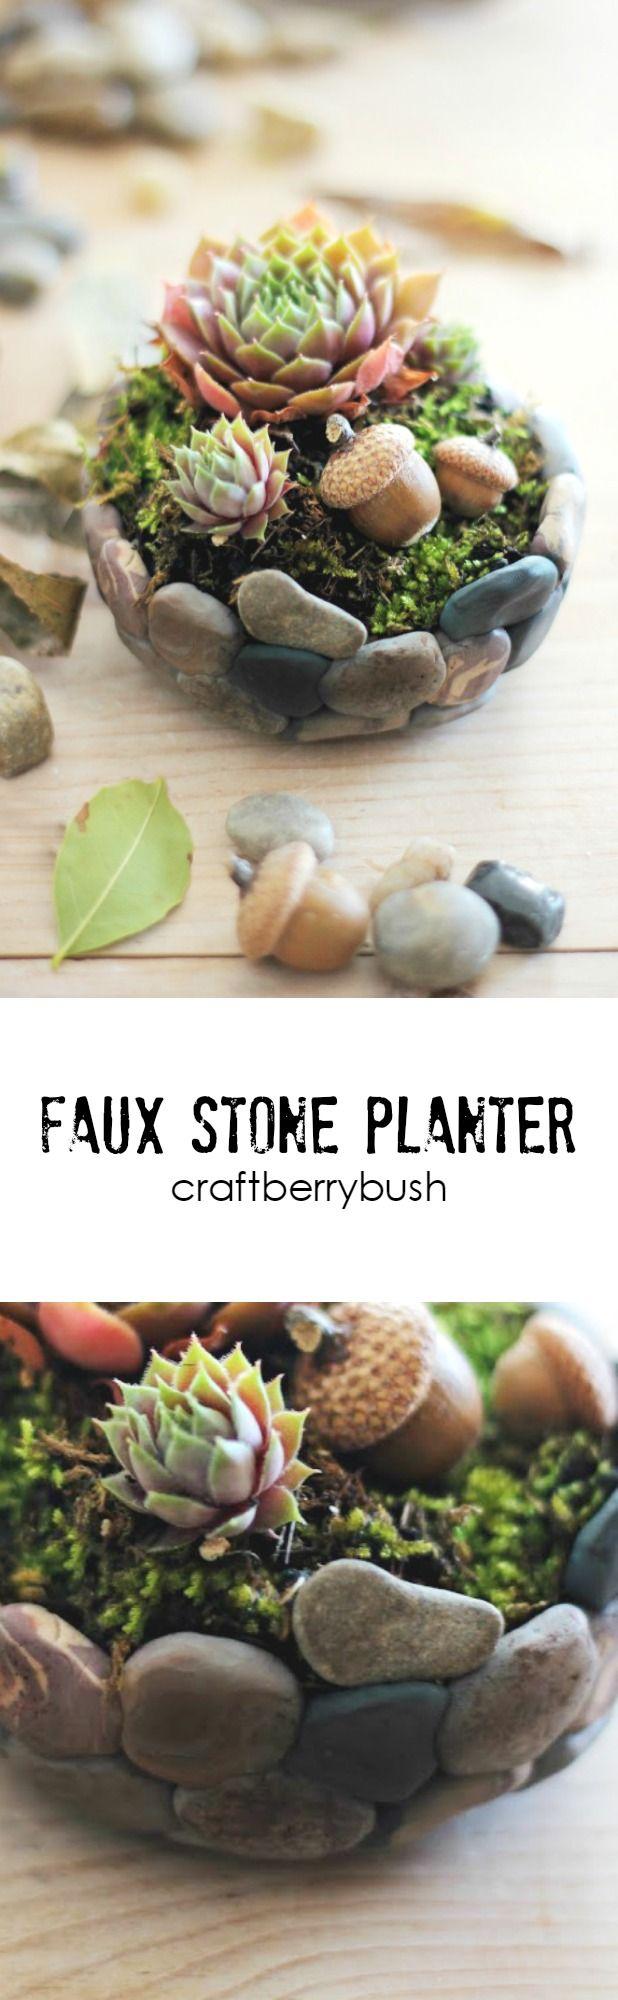 Craftberry Bush   How to make faux sea glass with Polymer Clay   http://www.craftberrybush.com